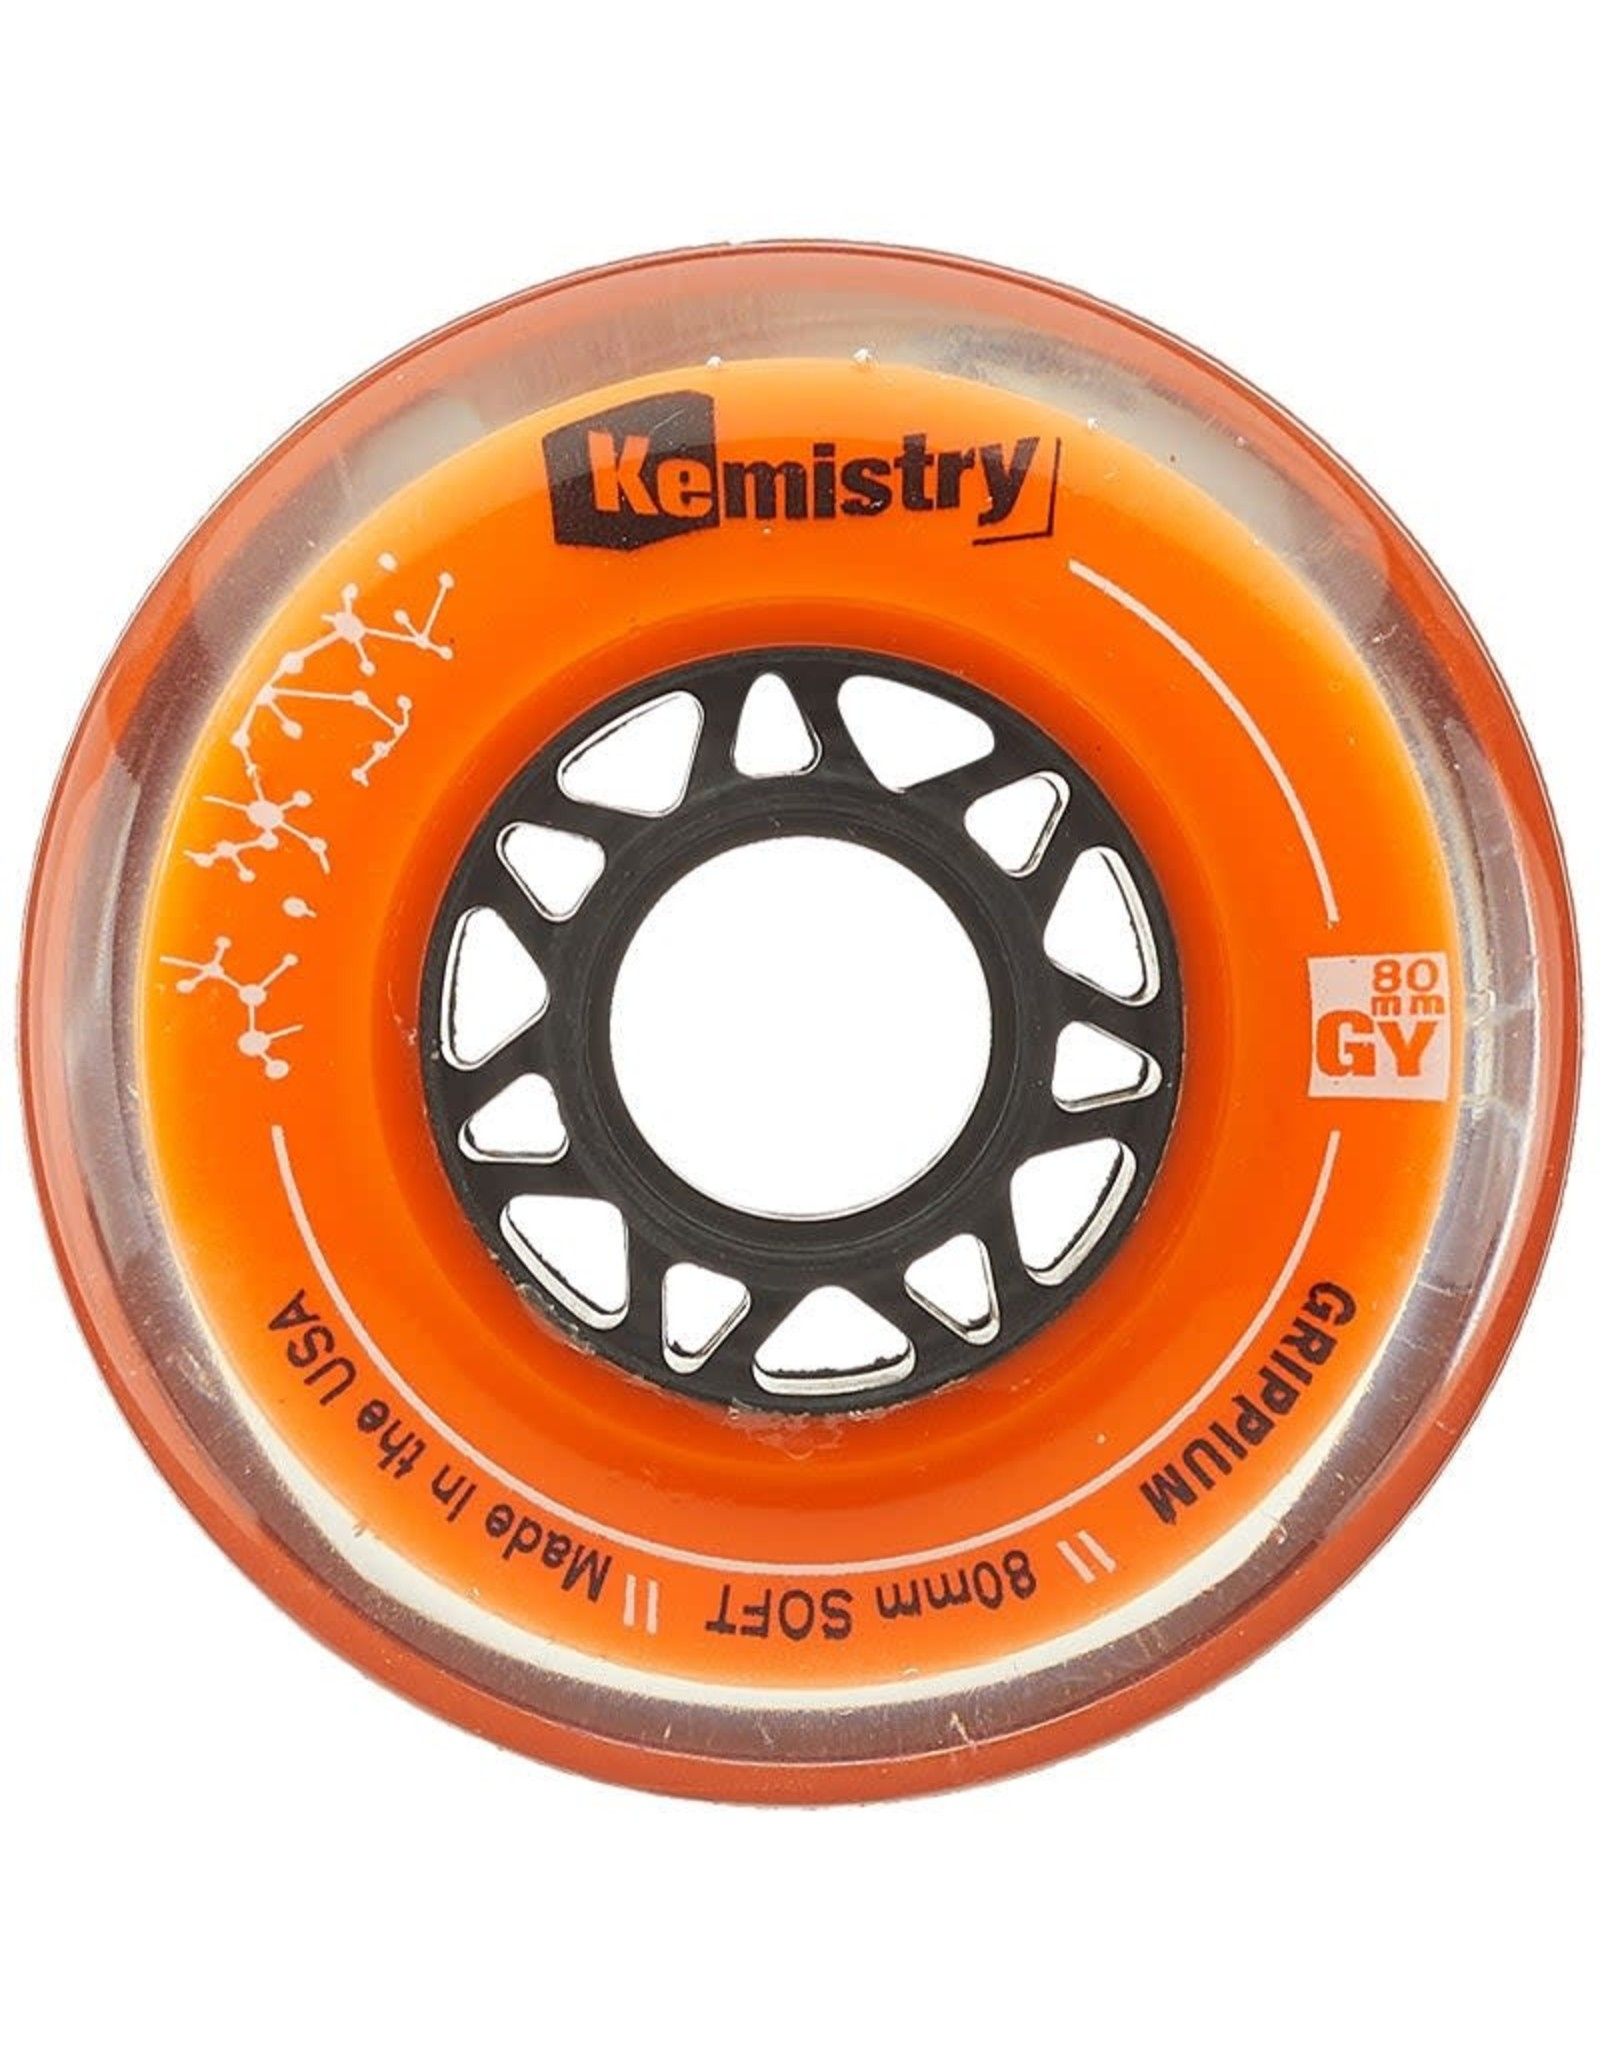 Tour Kemistry Orange Grippium Hockey Wheels